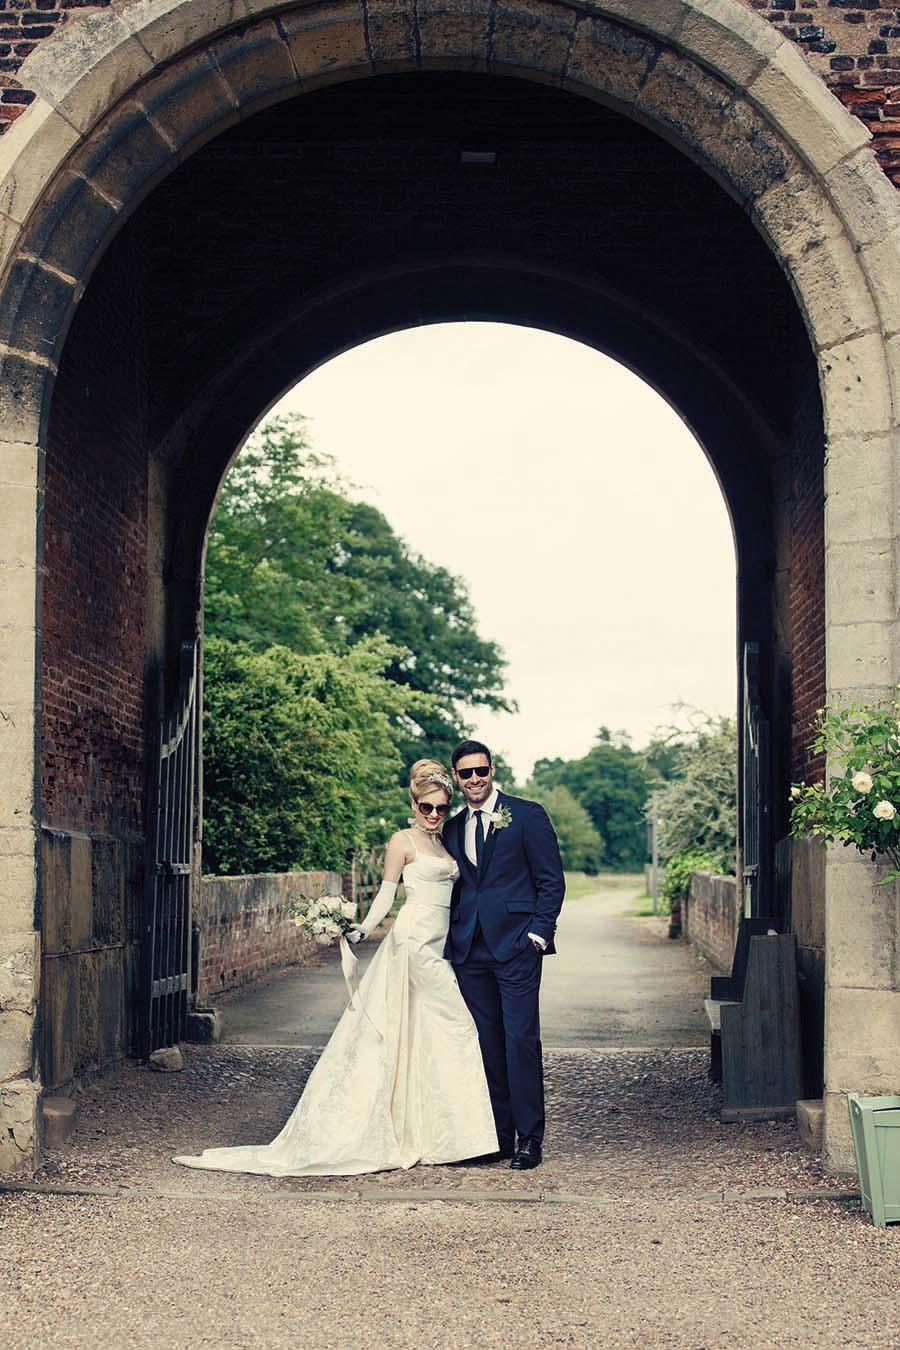 Buckinghams Wedding Magazine – Hodsock Photoshoot 2018 – Dottie Photography (71)